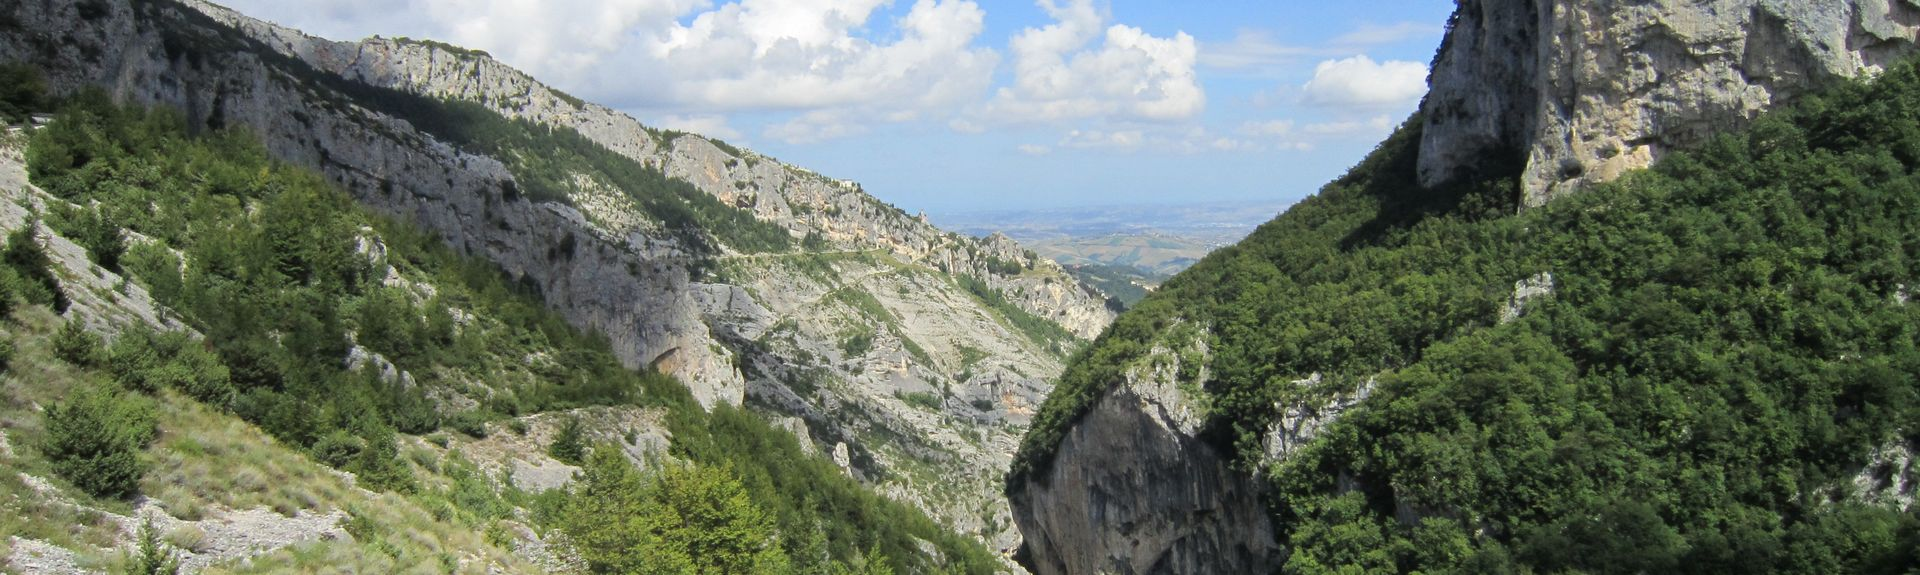 Palombaro, Abruzzo, Italië